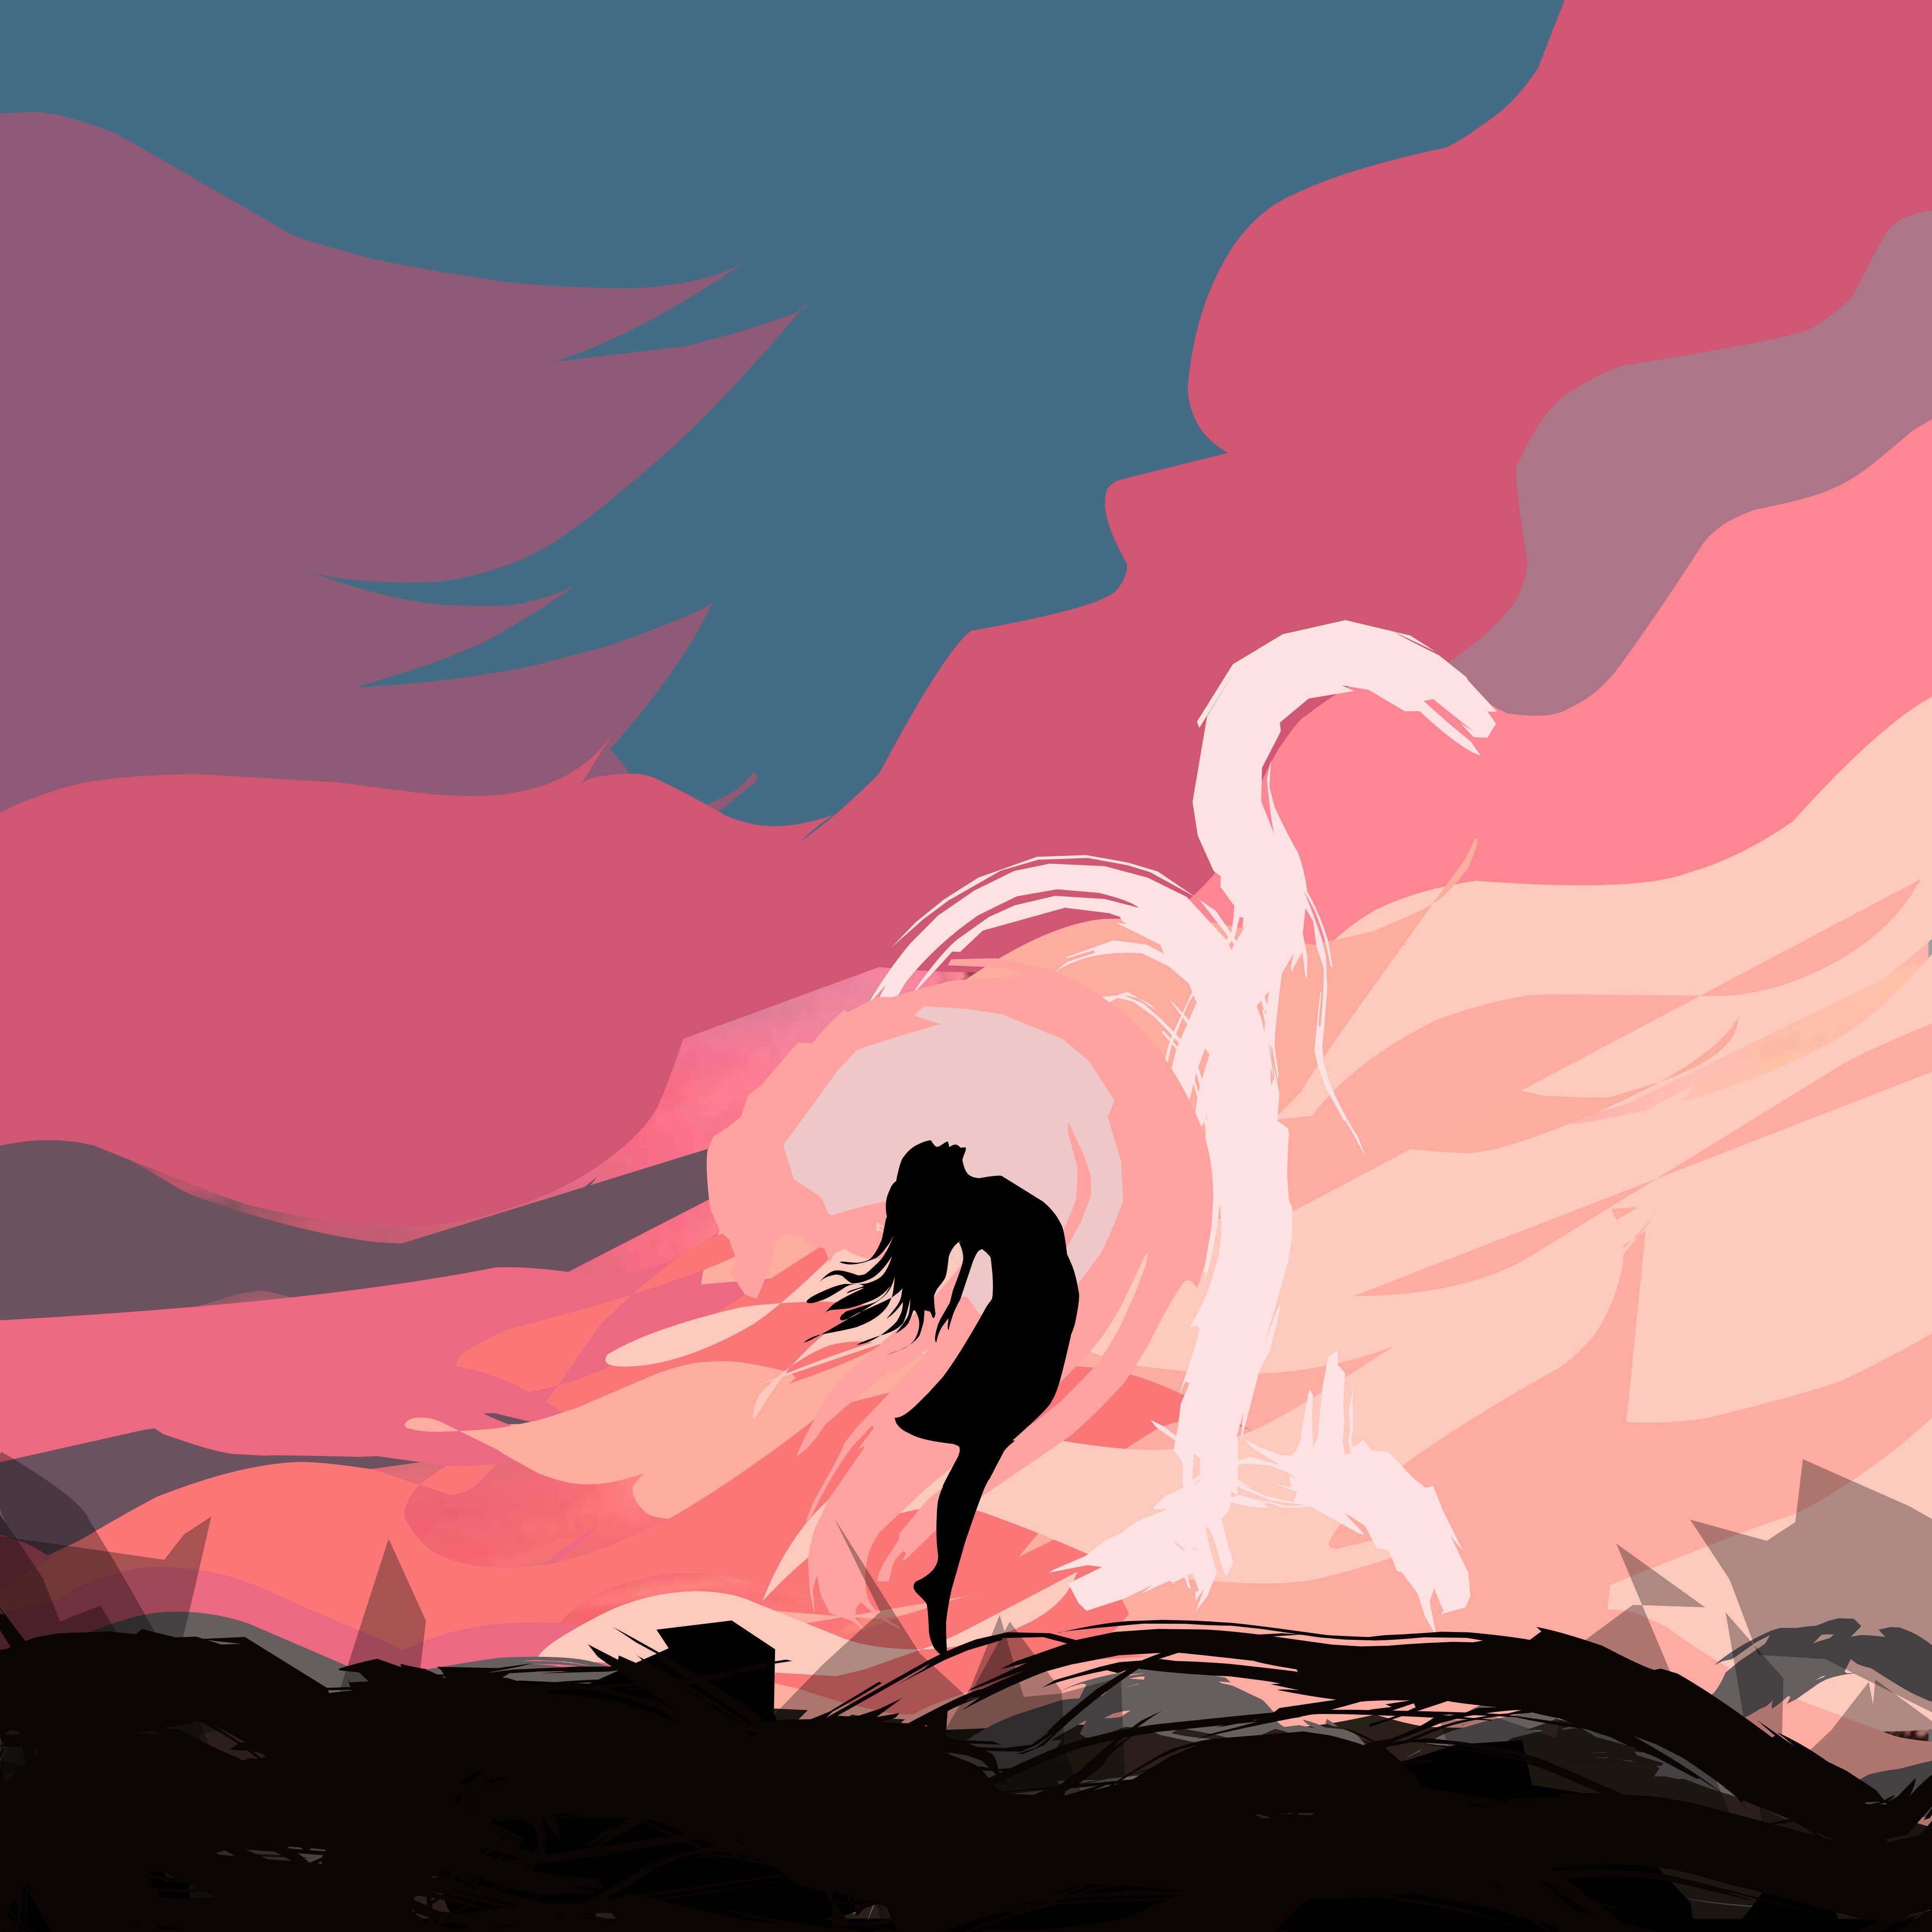 Dream Illustration